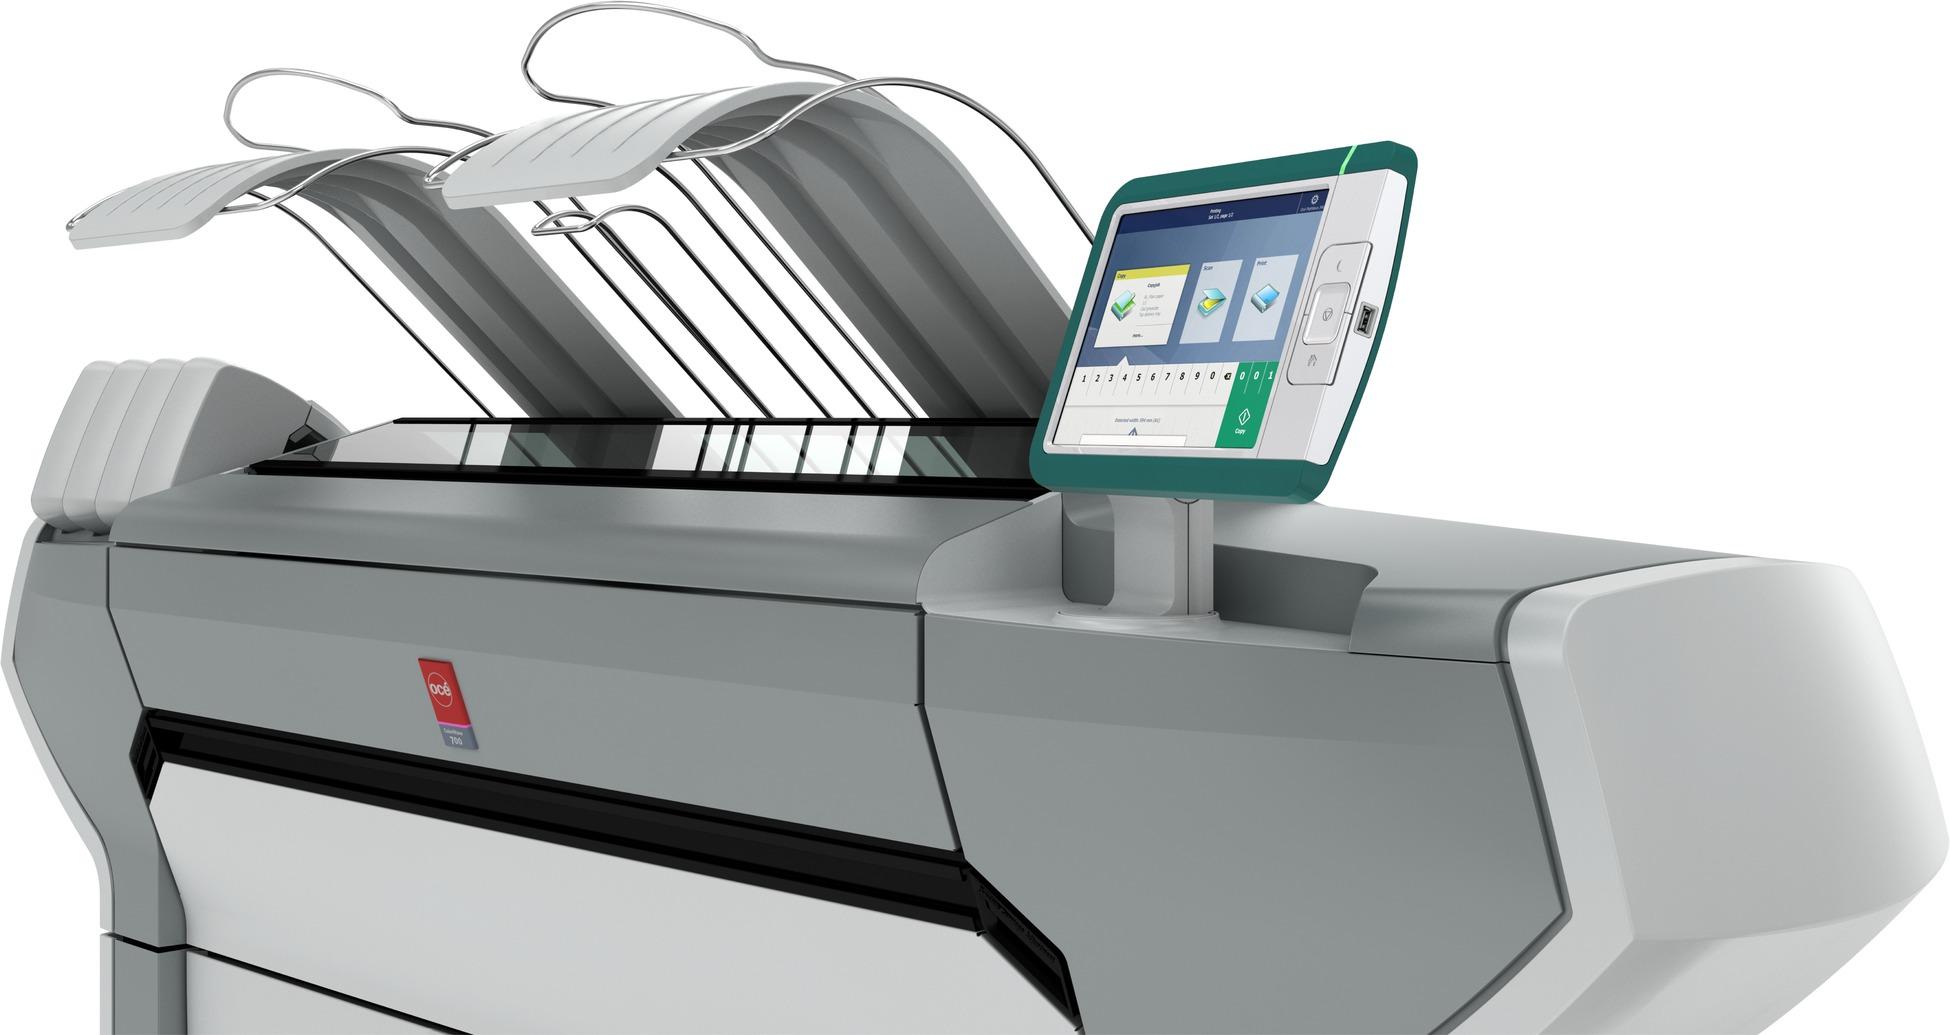 imprimante-canon-oce-colorwave700-traceurmoinscher3